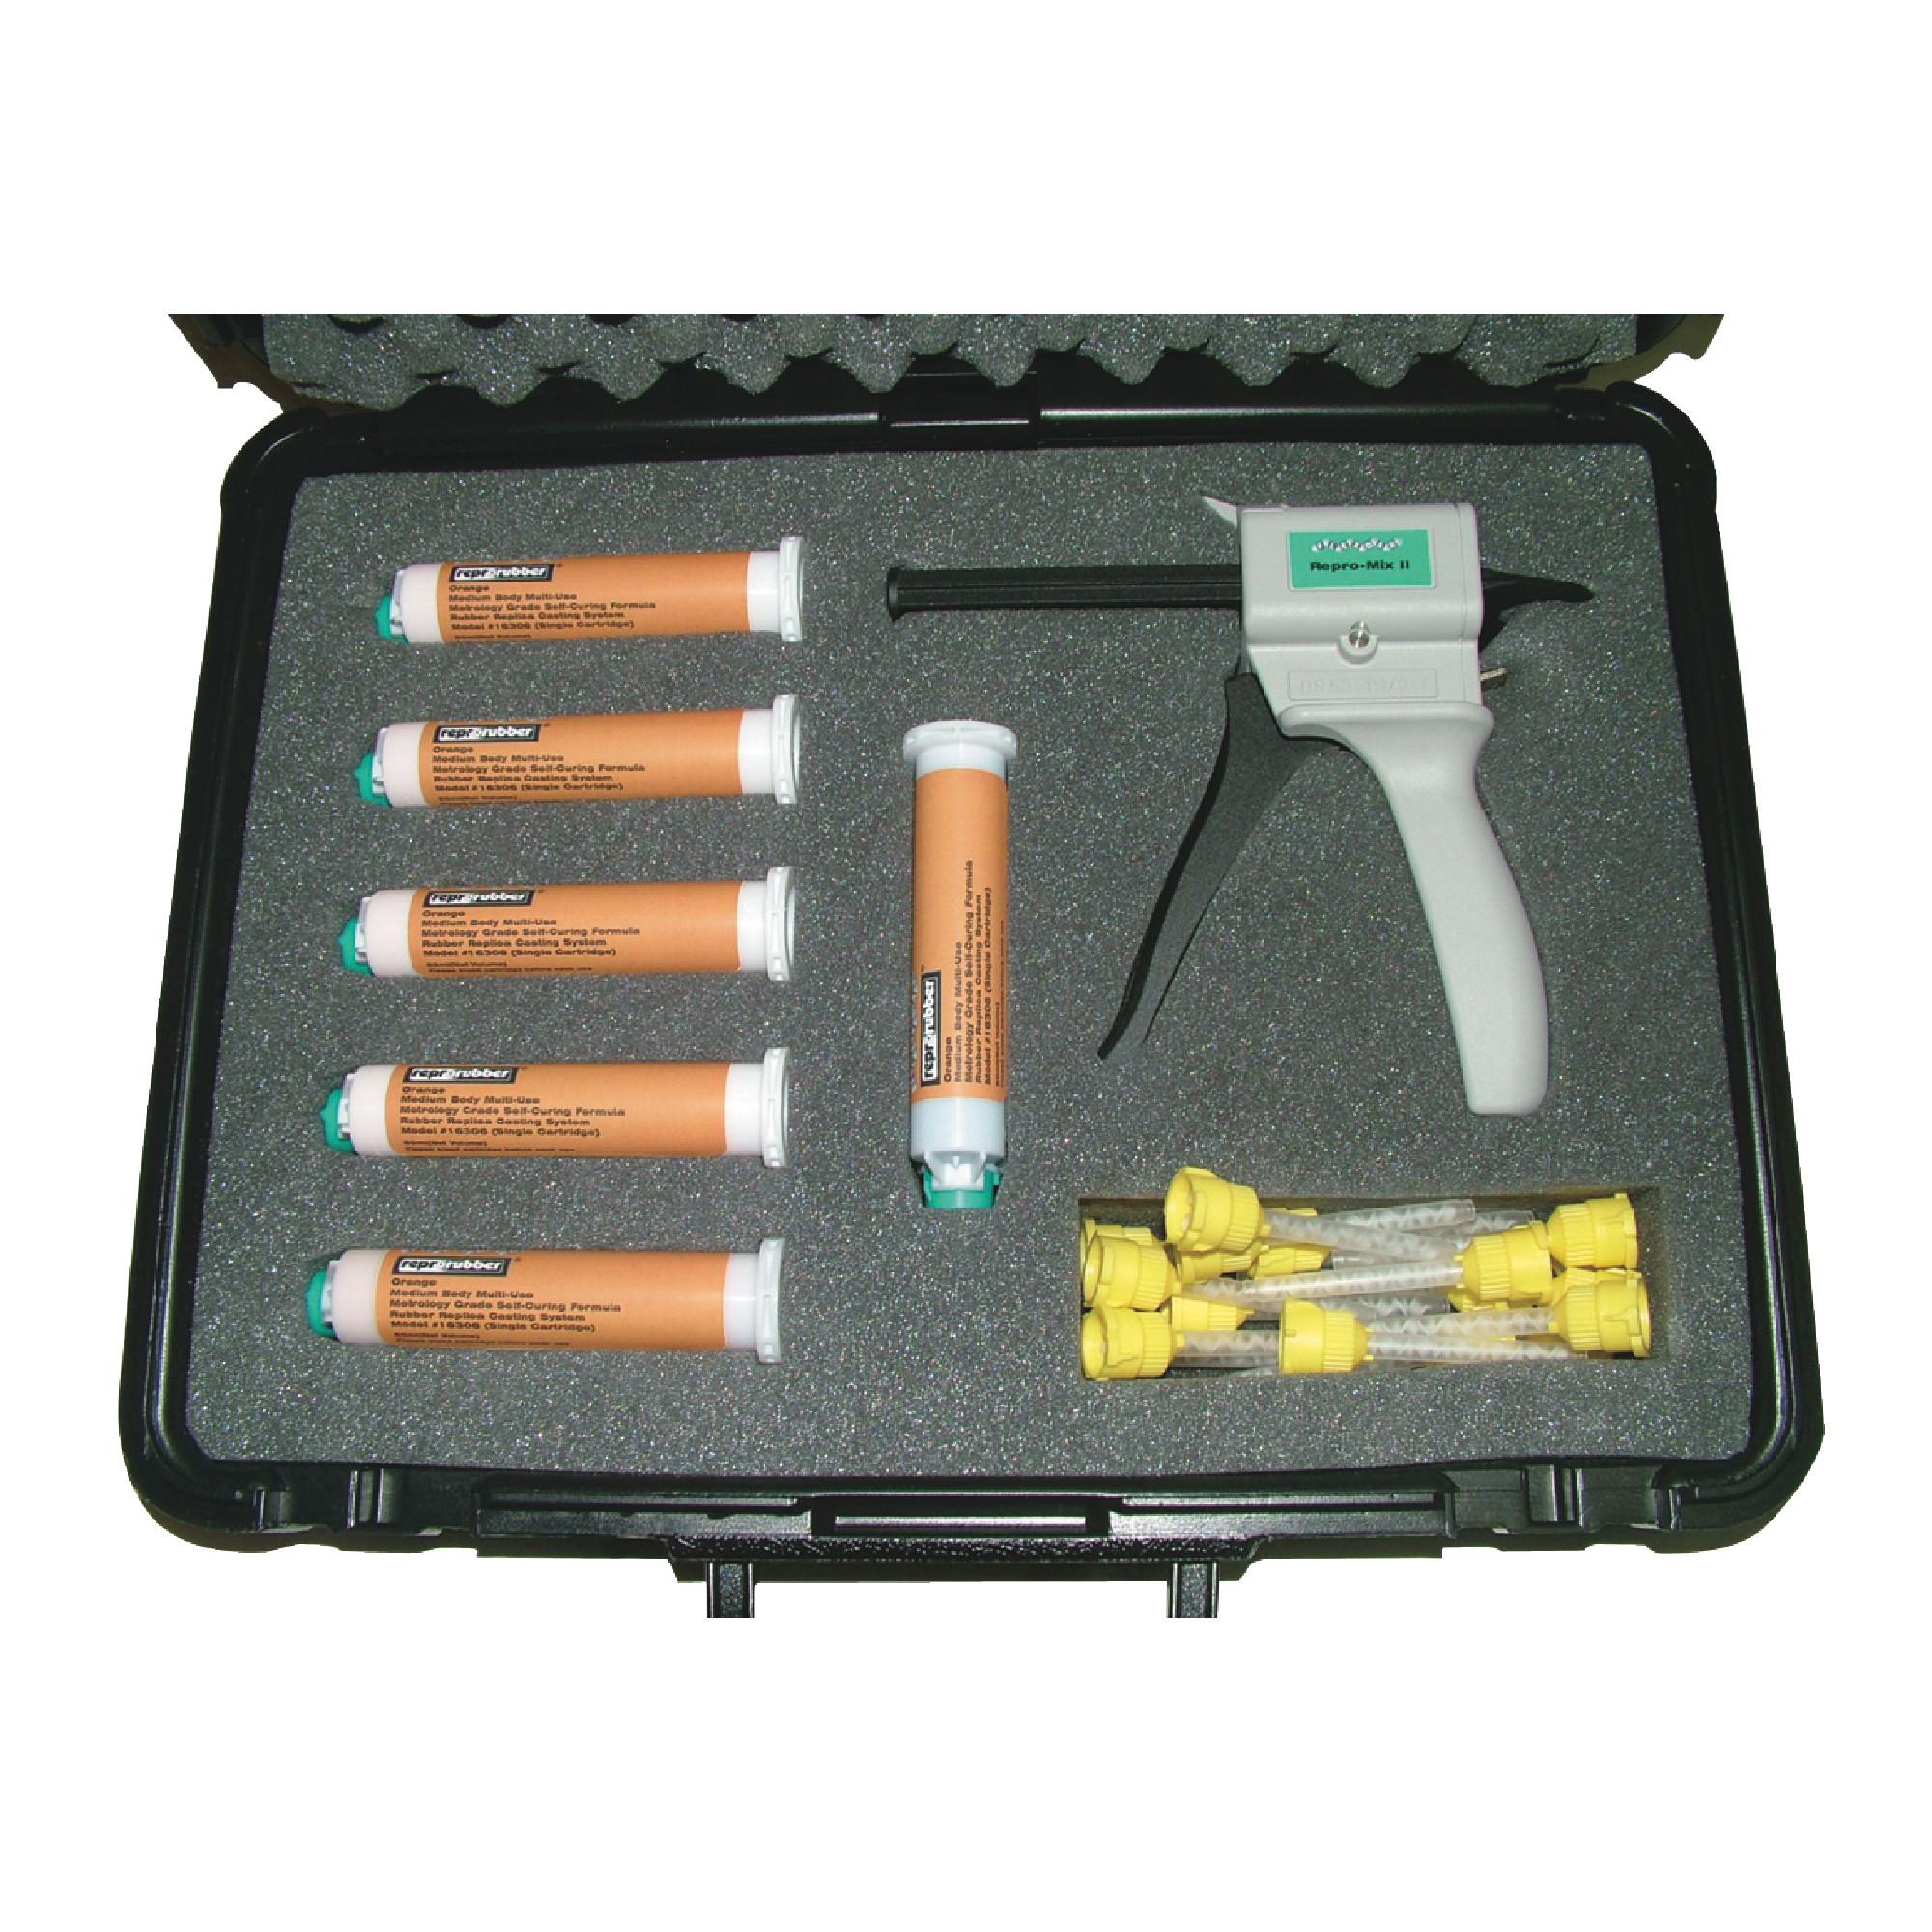 Reprorubber Orange Quick Dispense Cartridge System Kit